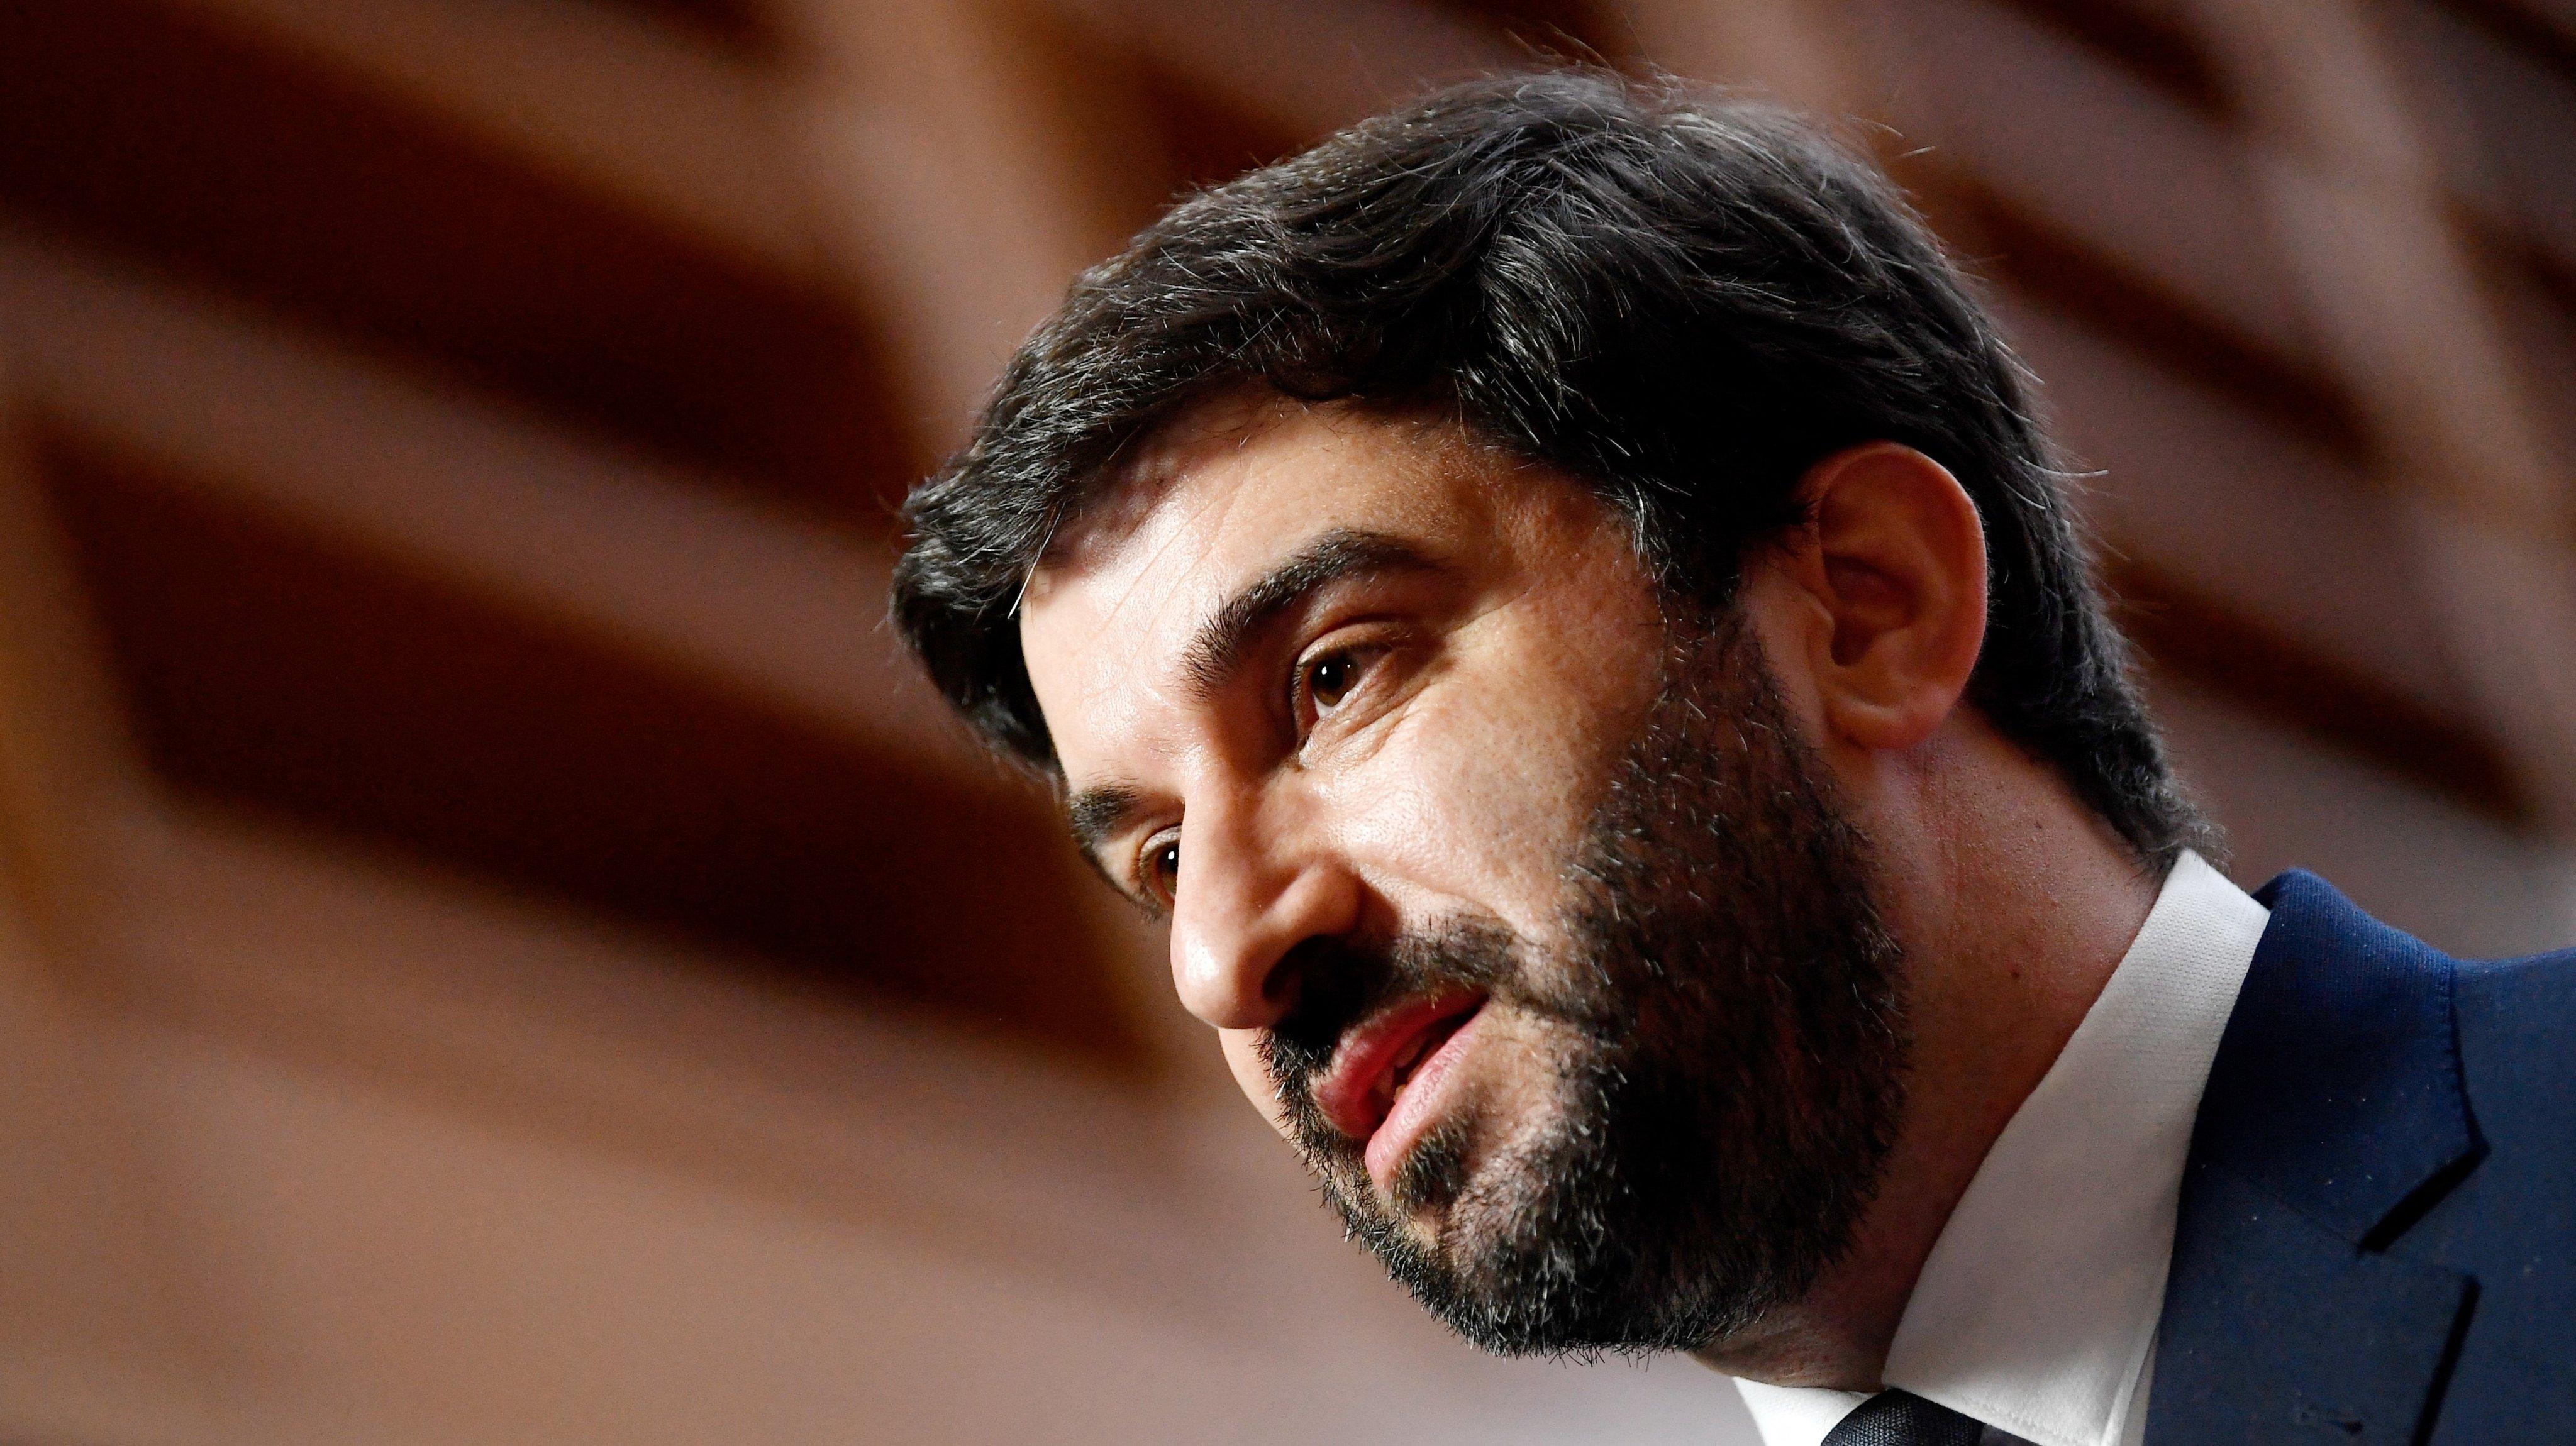 BELGIUM-PORTUGAL-EU-POLITICS-EDUCATION